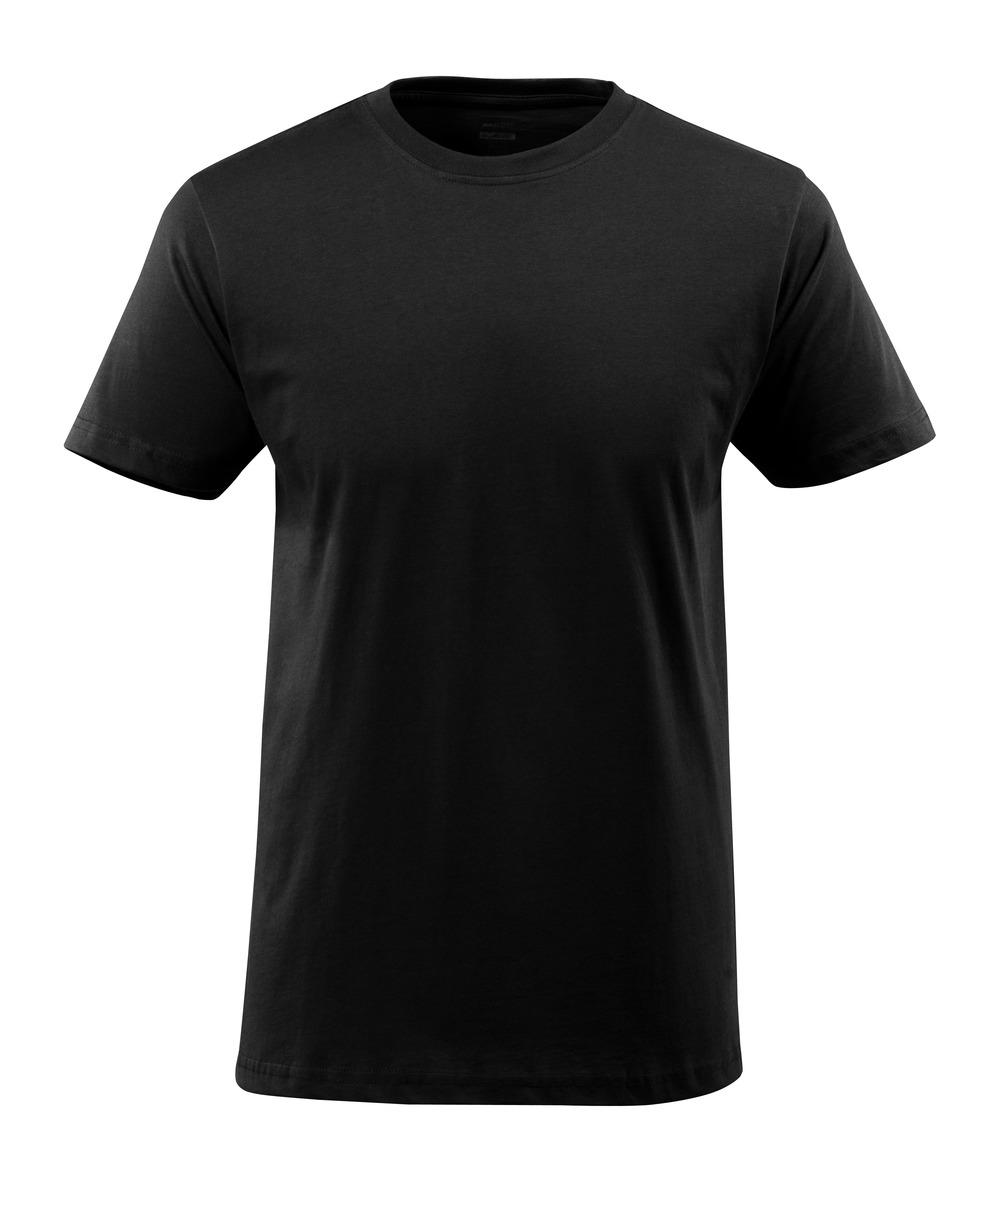 51579-965-90 Camiseta - negro profundo